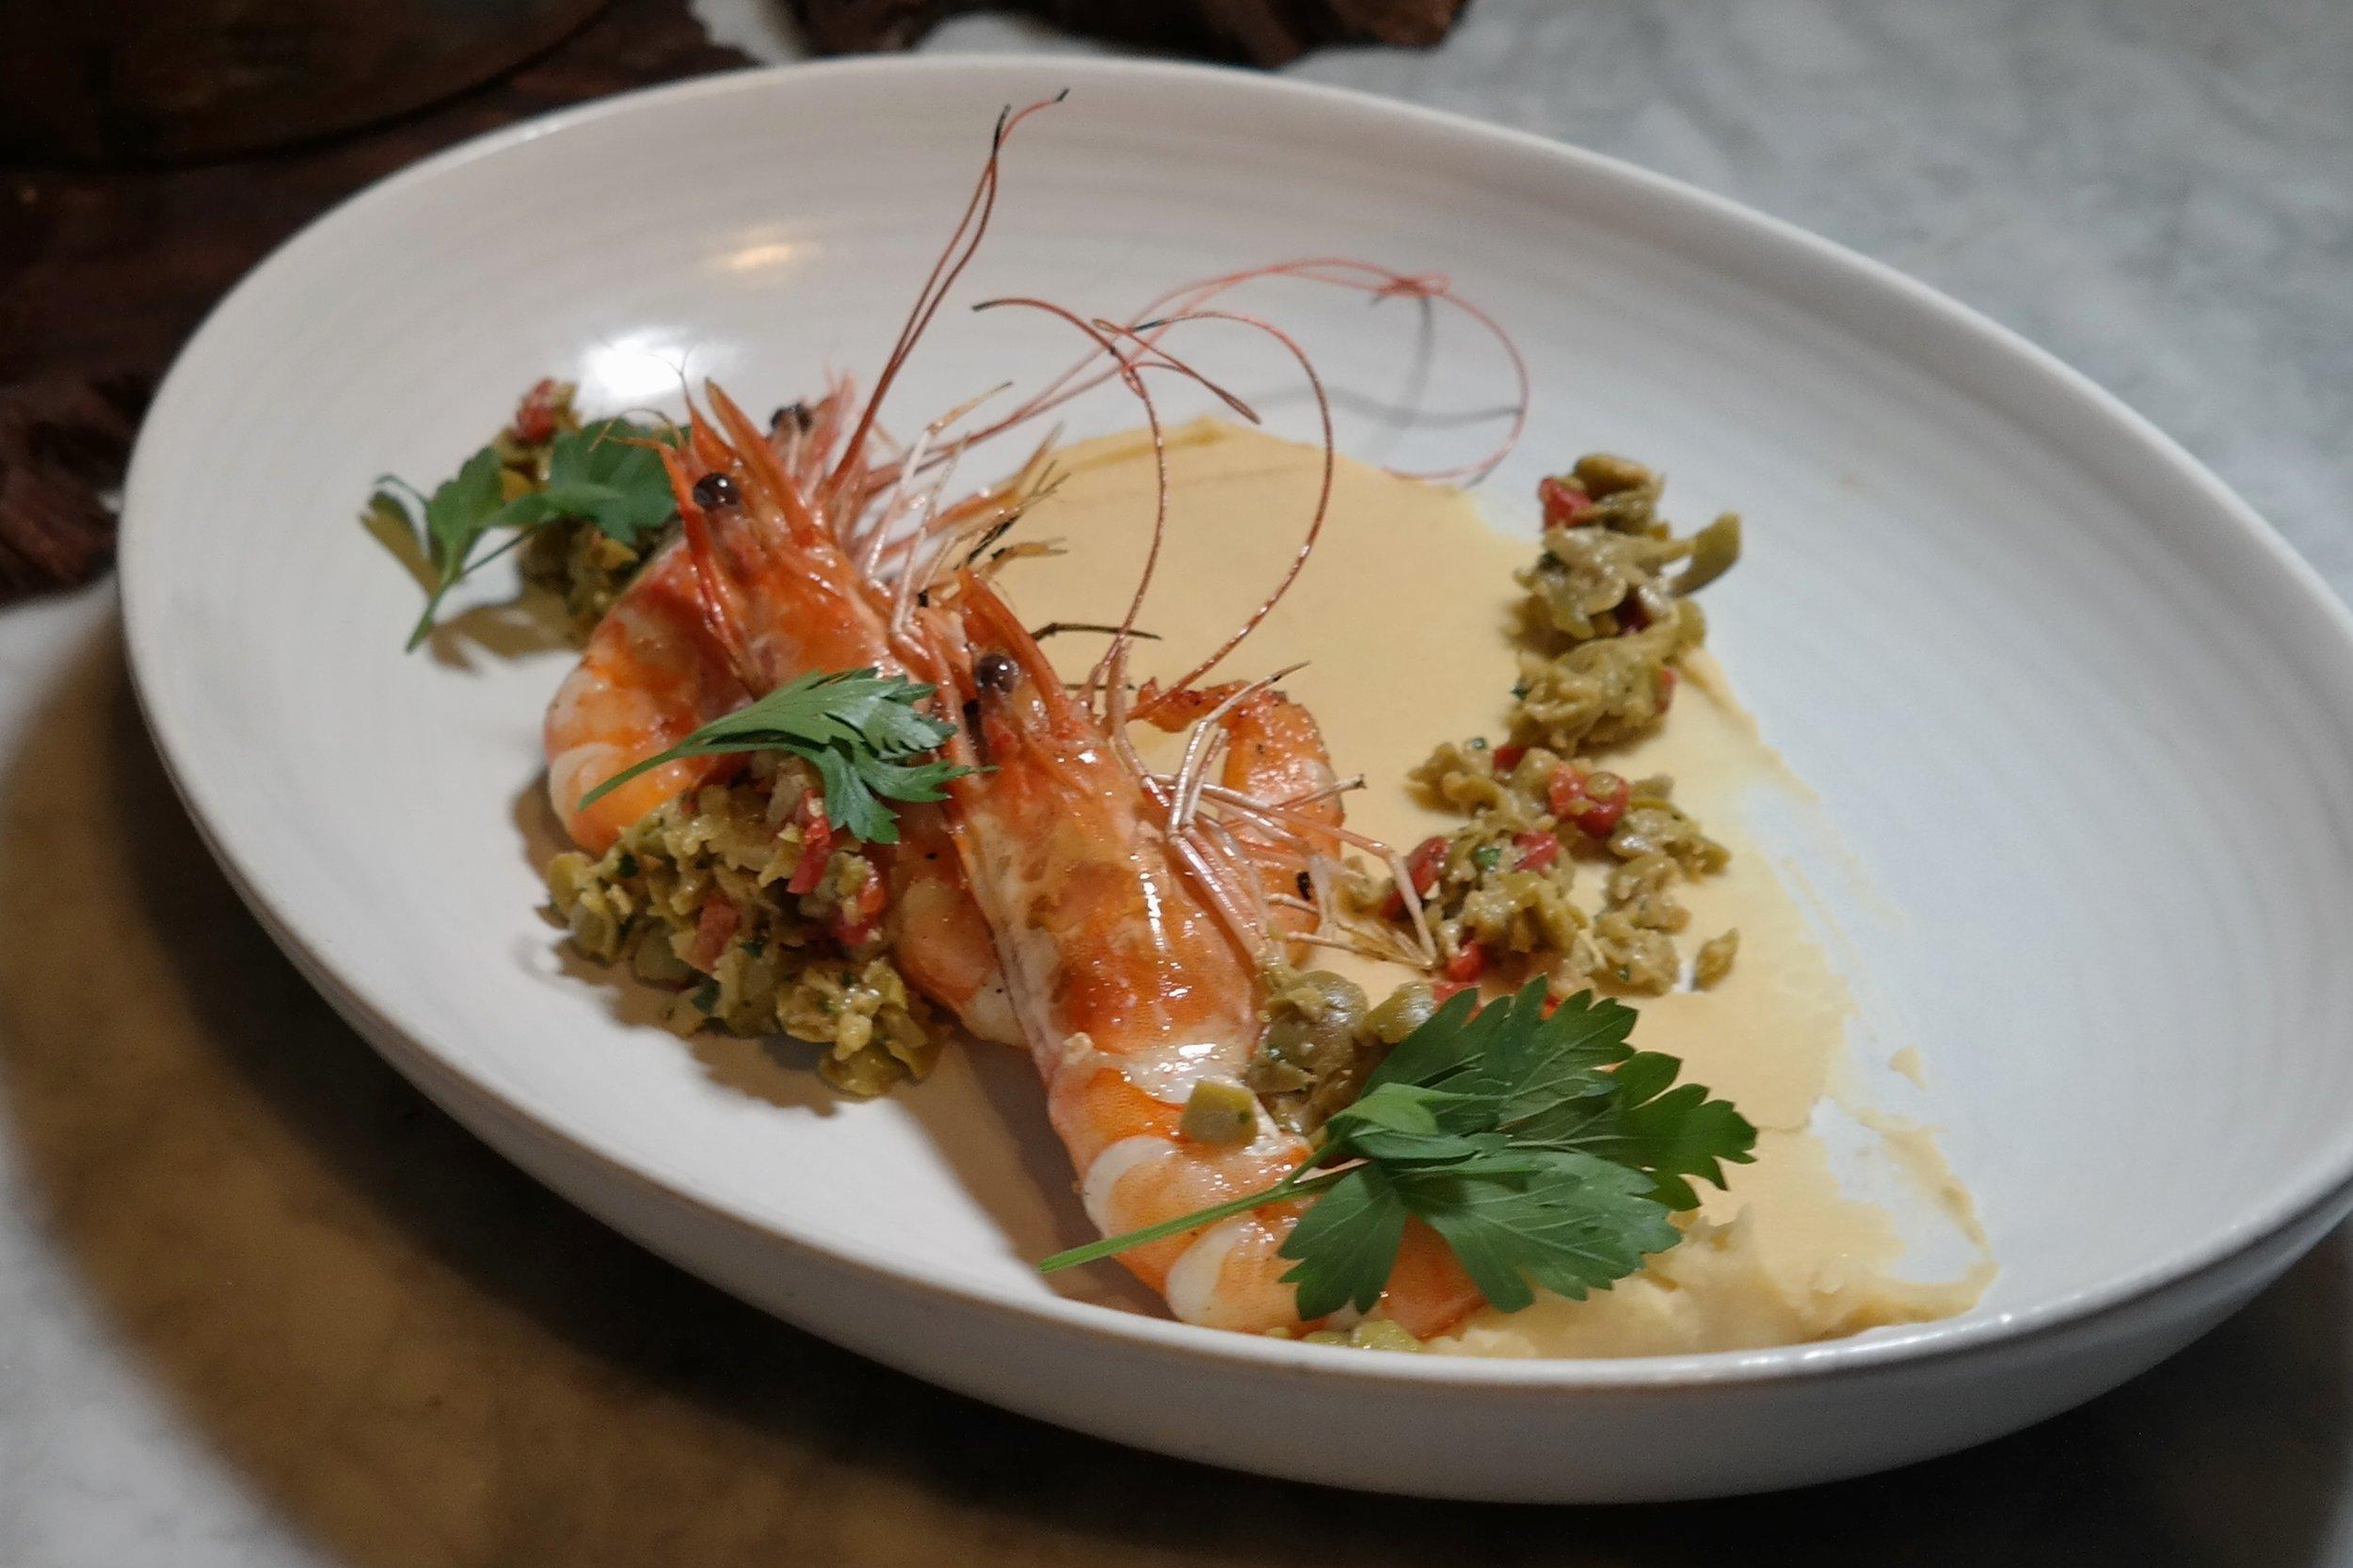 T. Cook's: Garlic roasted prawns, cannellini bean puree, picholine olive tapenade